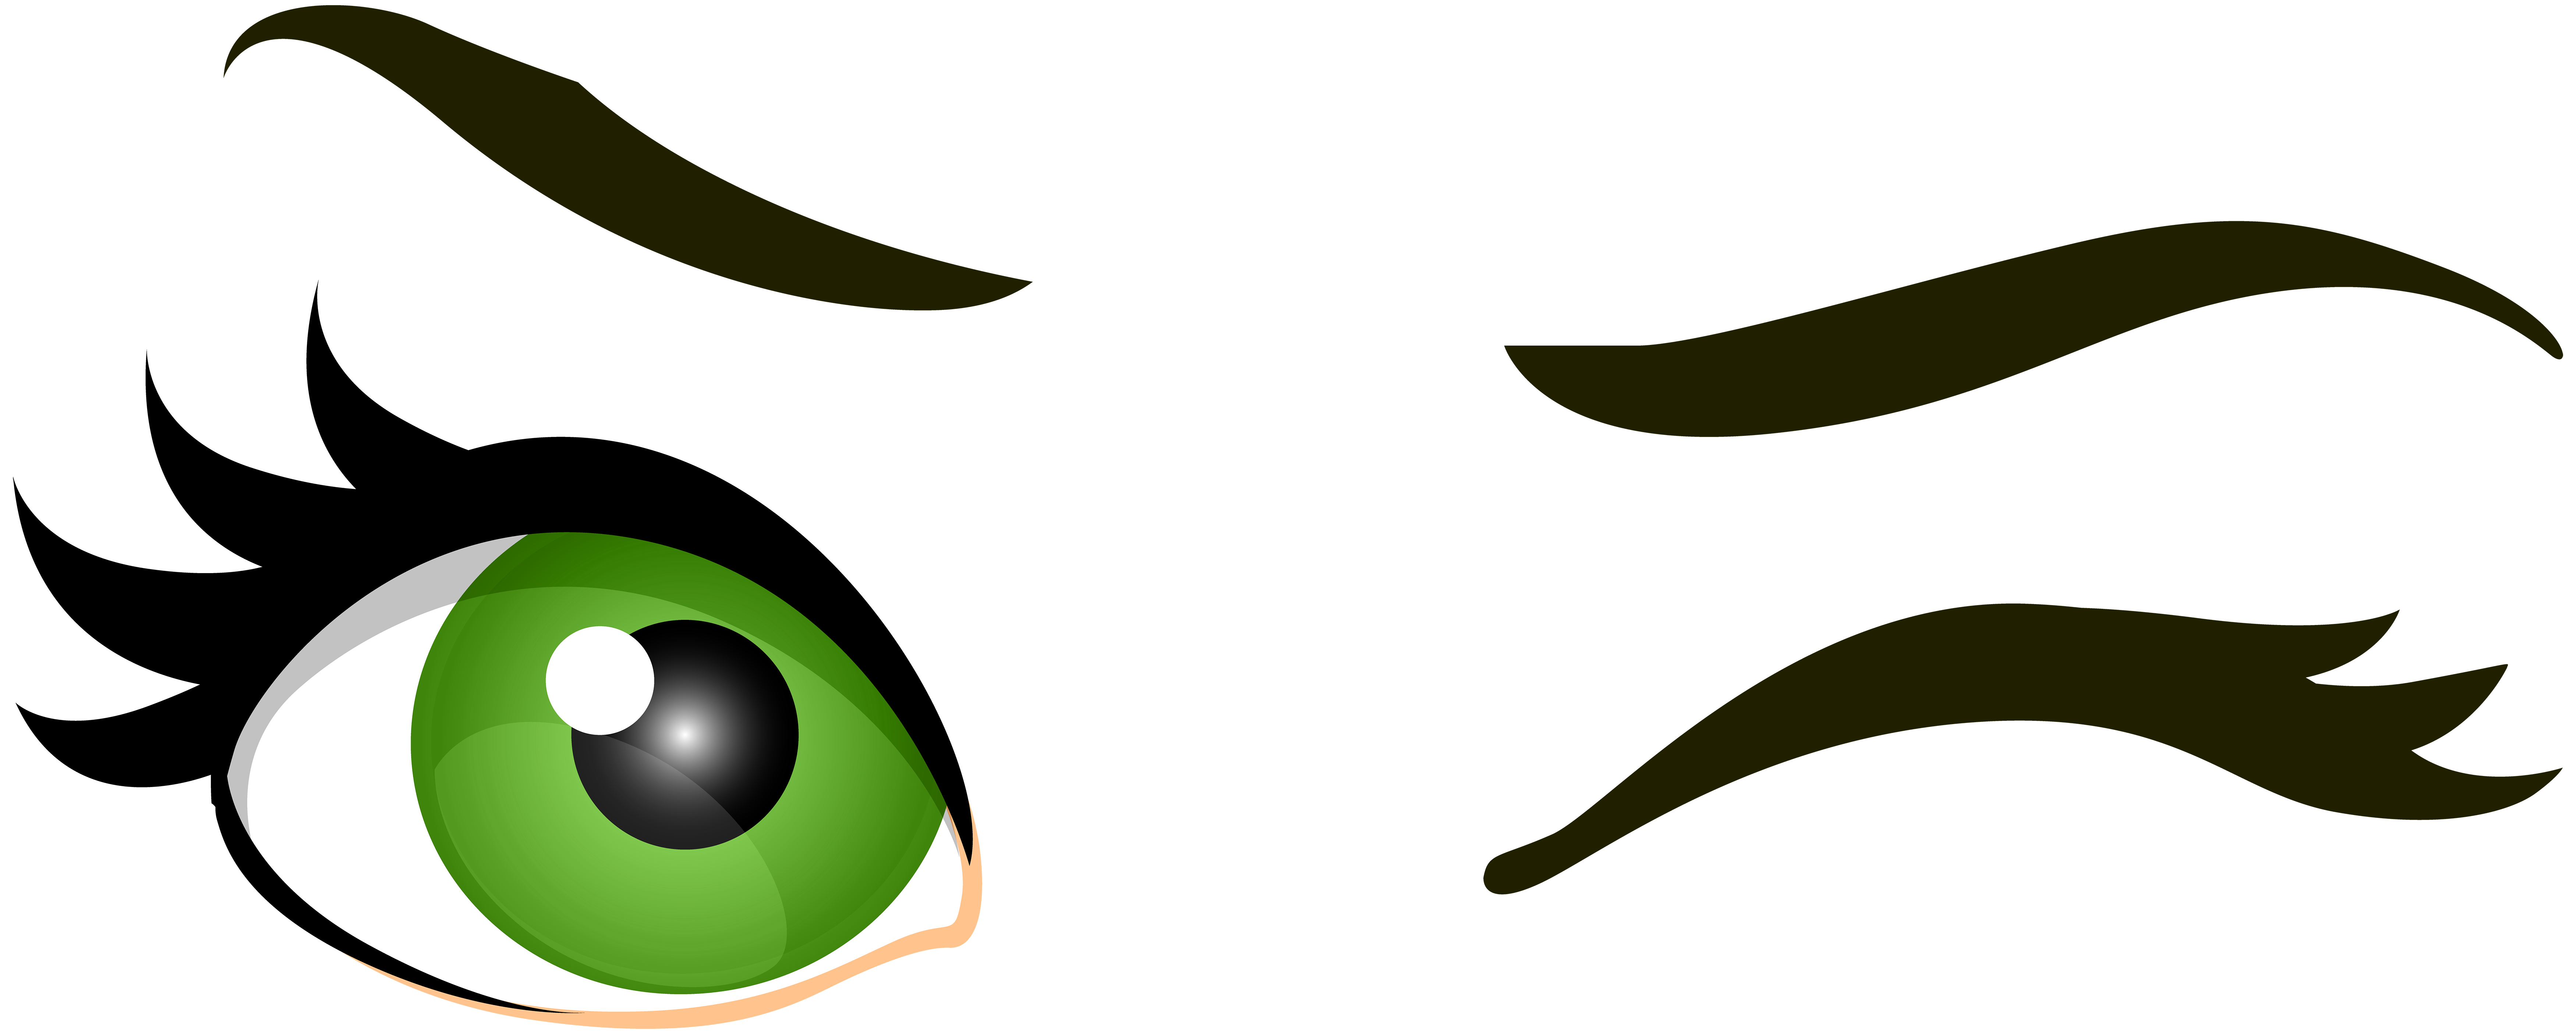 Eyeballs clipart large eye. Green winking eyes png